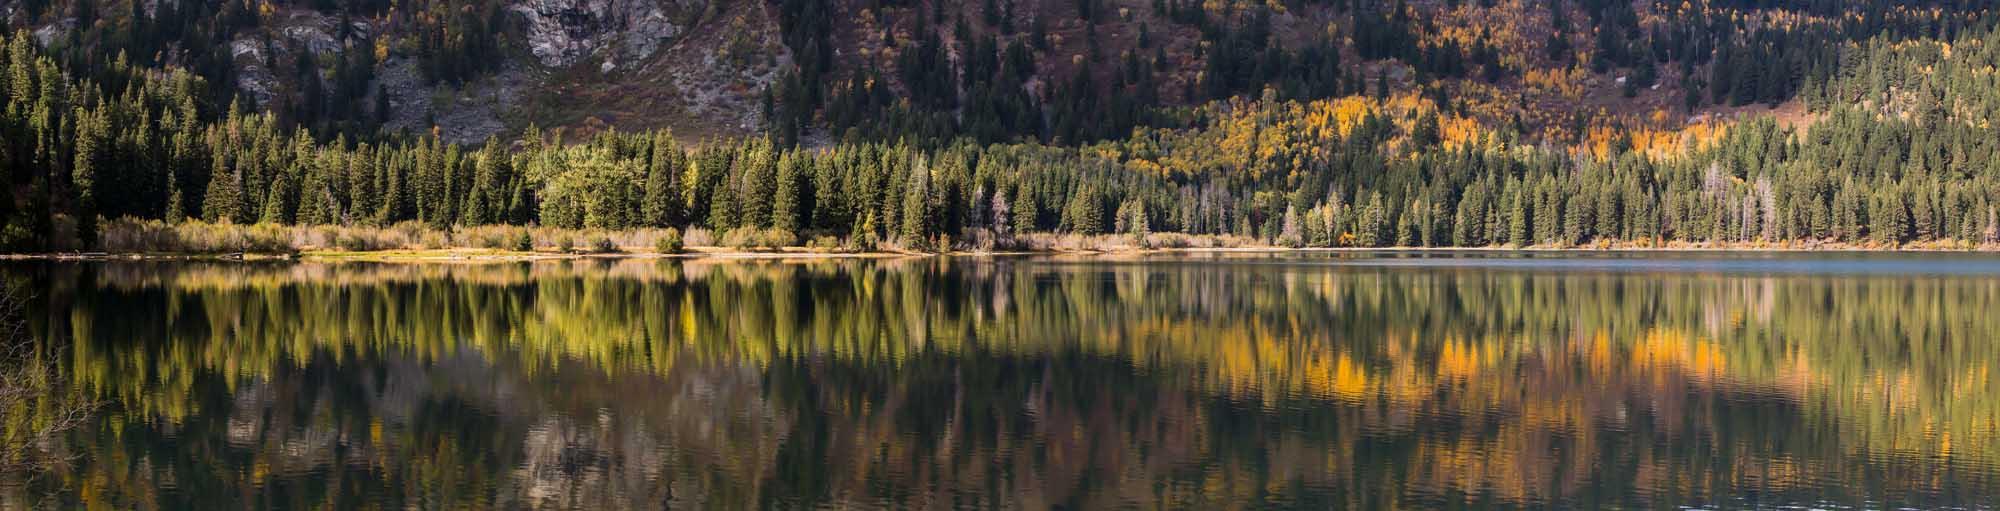 Untitled_Panorama19 (1).jpg